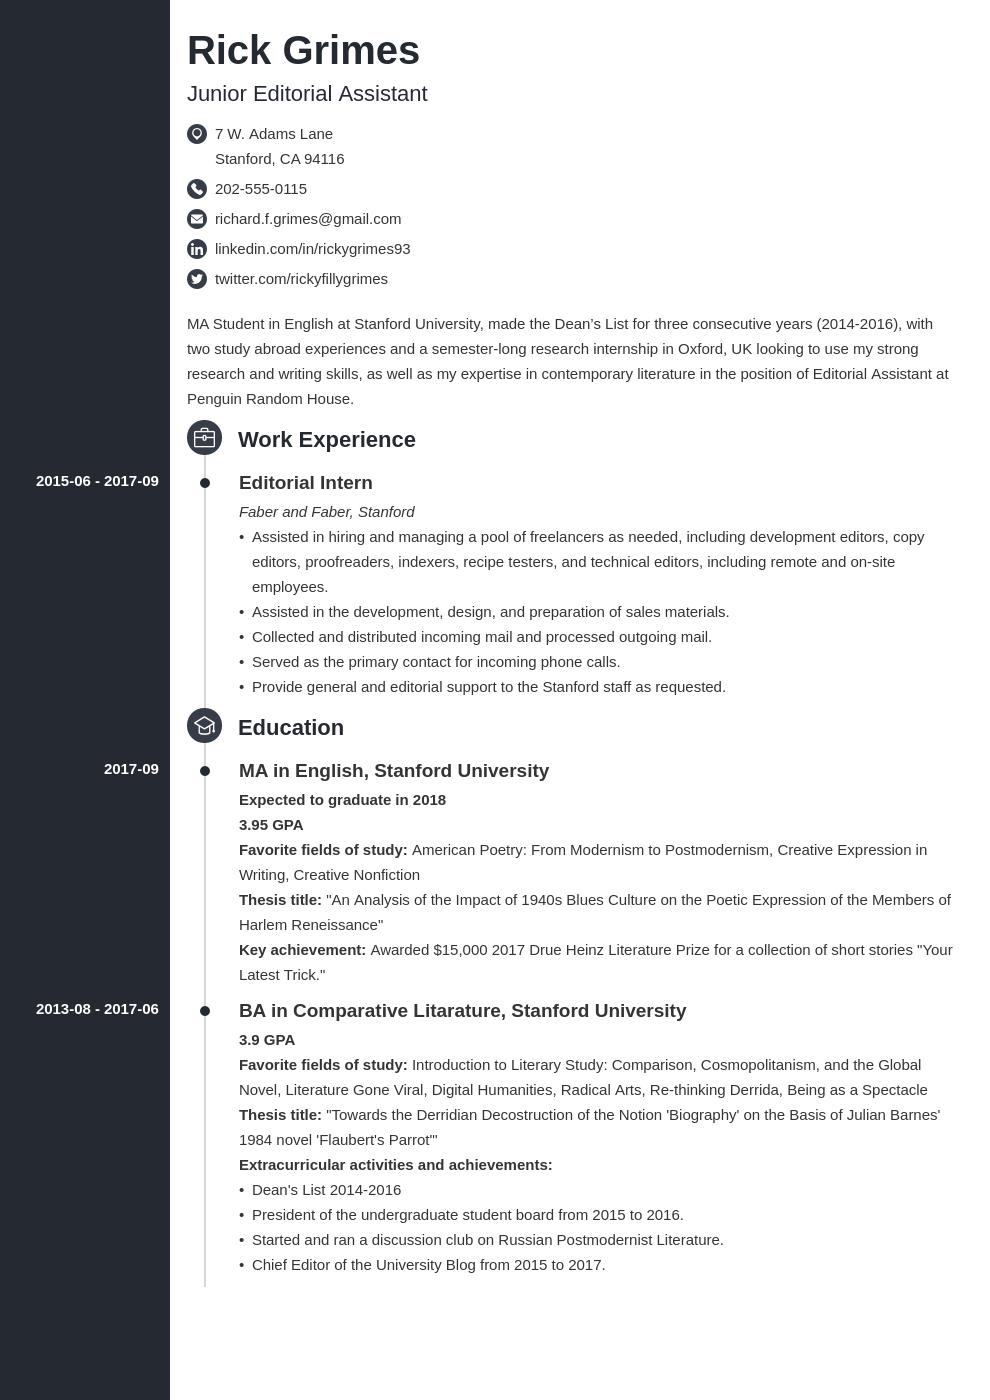 Graduate Student CV Example (Academic CV Template for